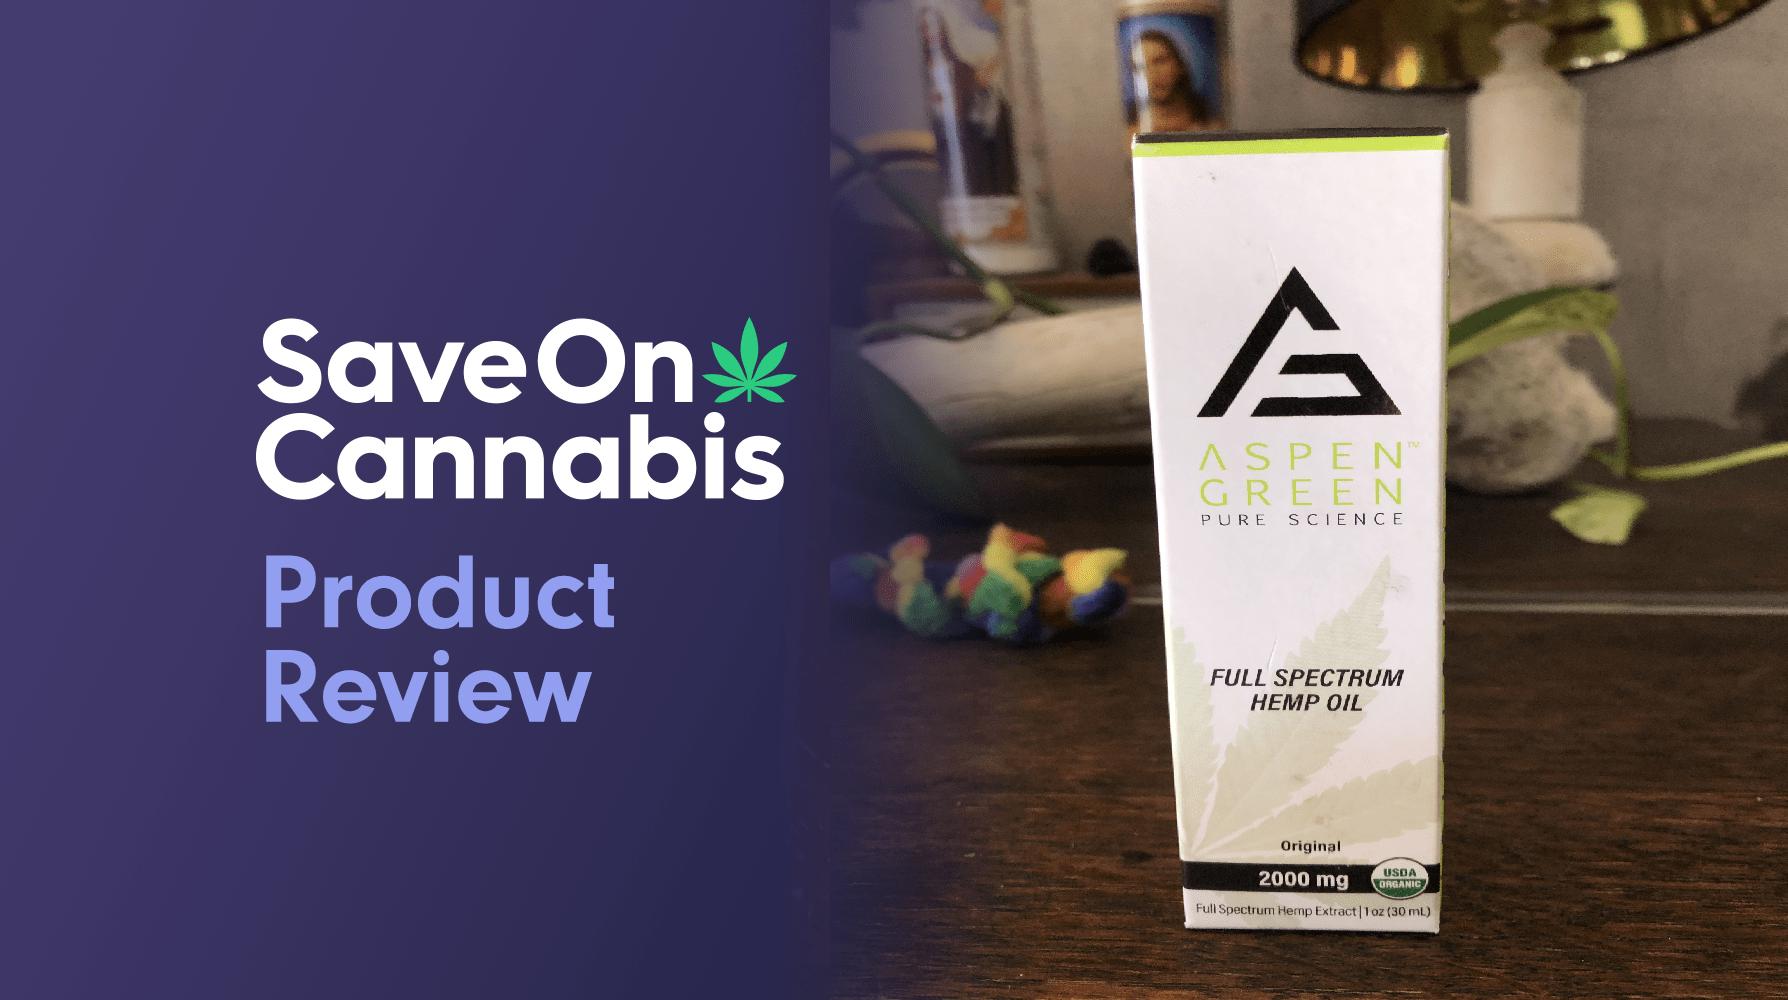 aspen green full spectrum hemp oil 2000 mg save on cannabis review Website